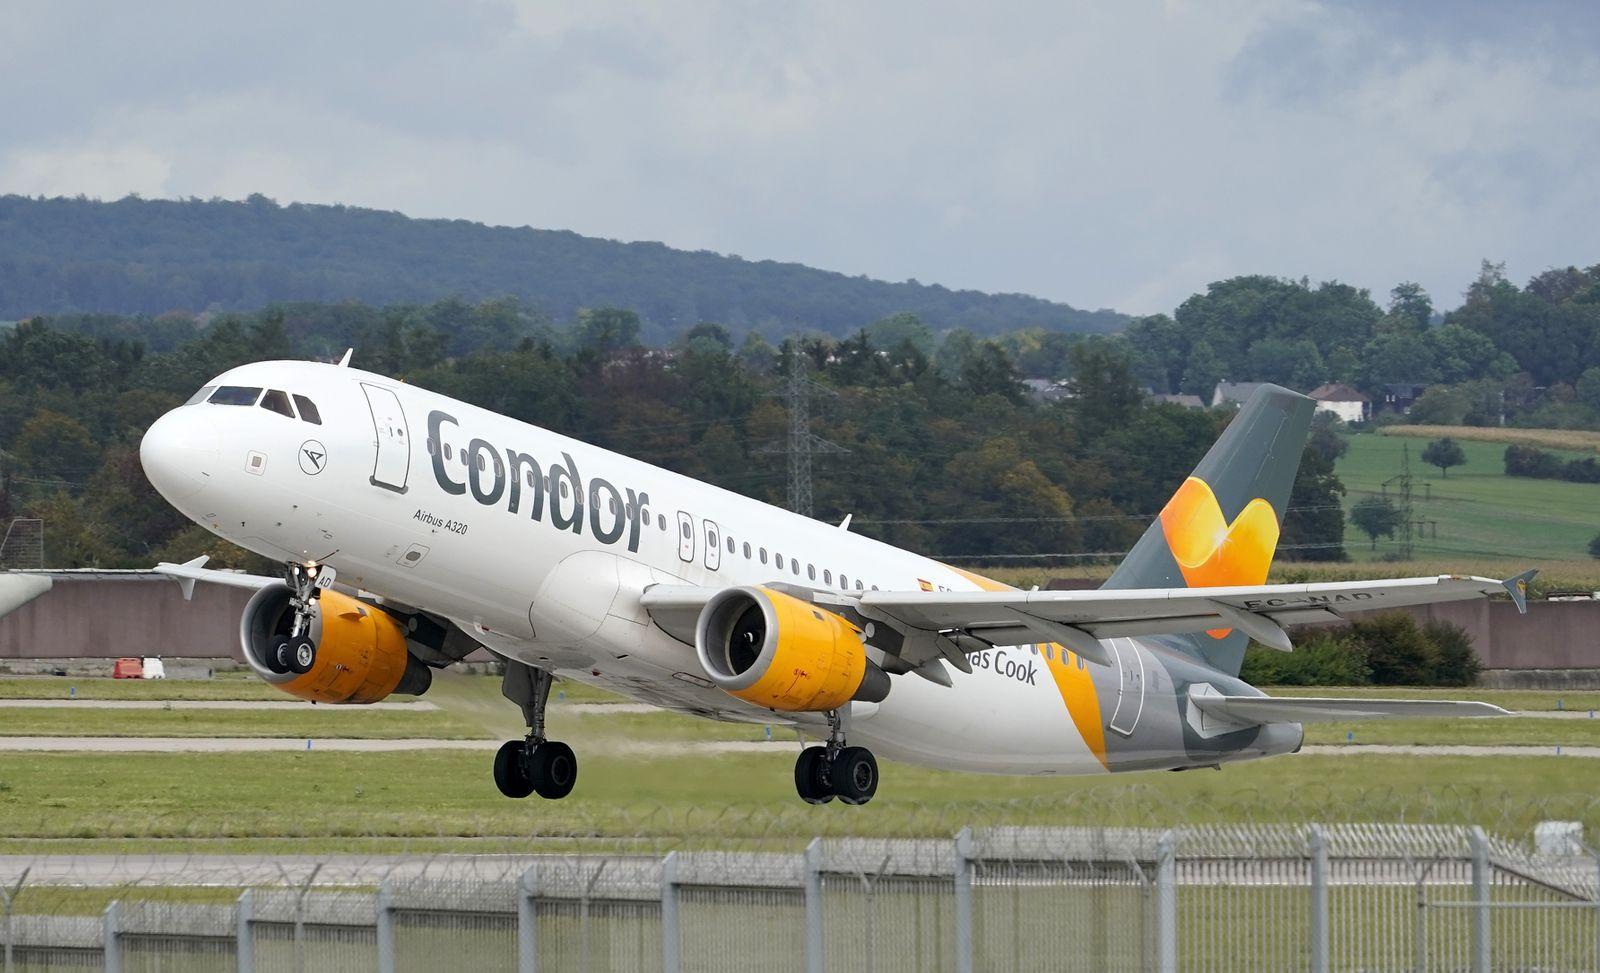 German charter airline Condor to receive additional financial aid, Leinfelden Echterdingen, Germany - 25 Sep 2019